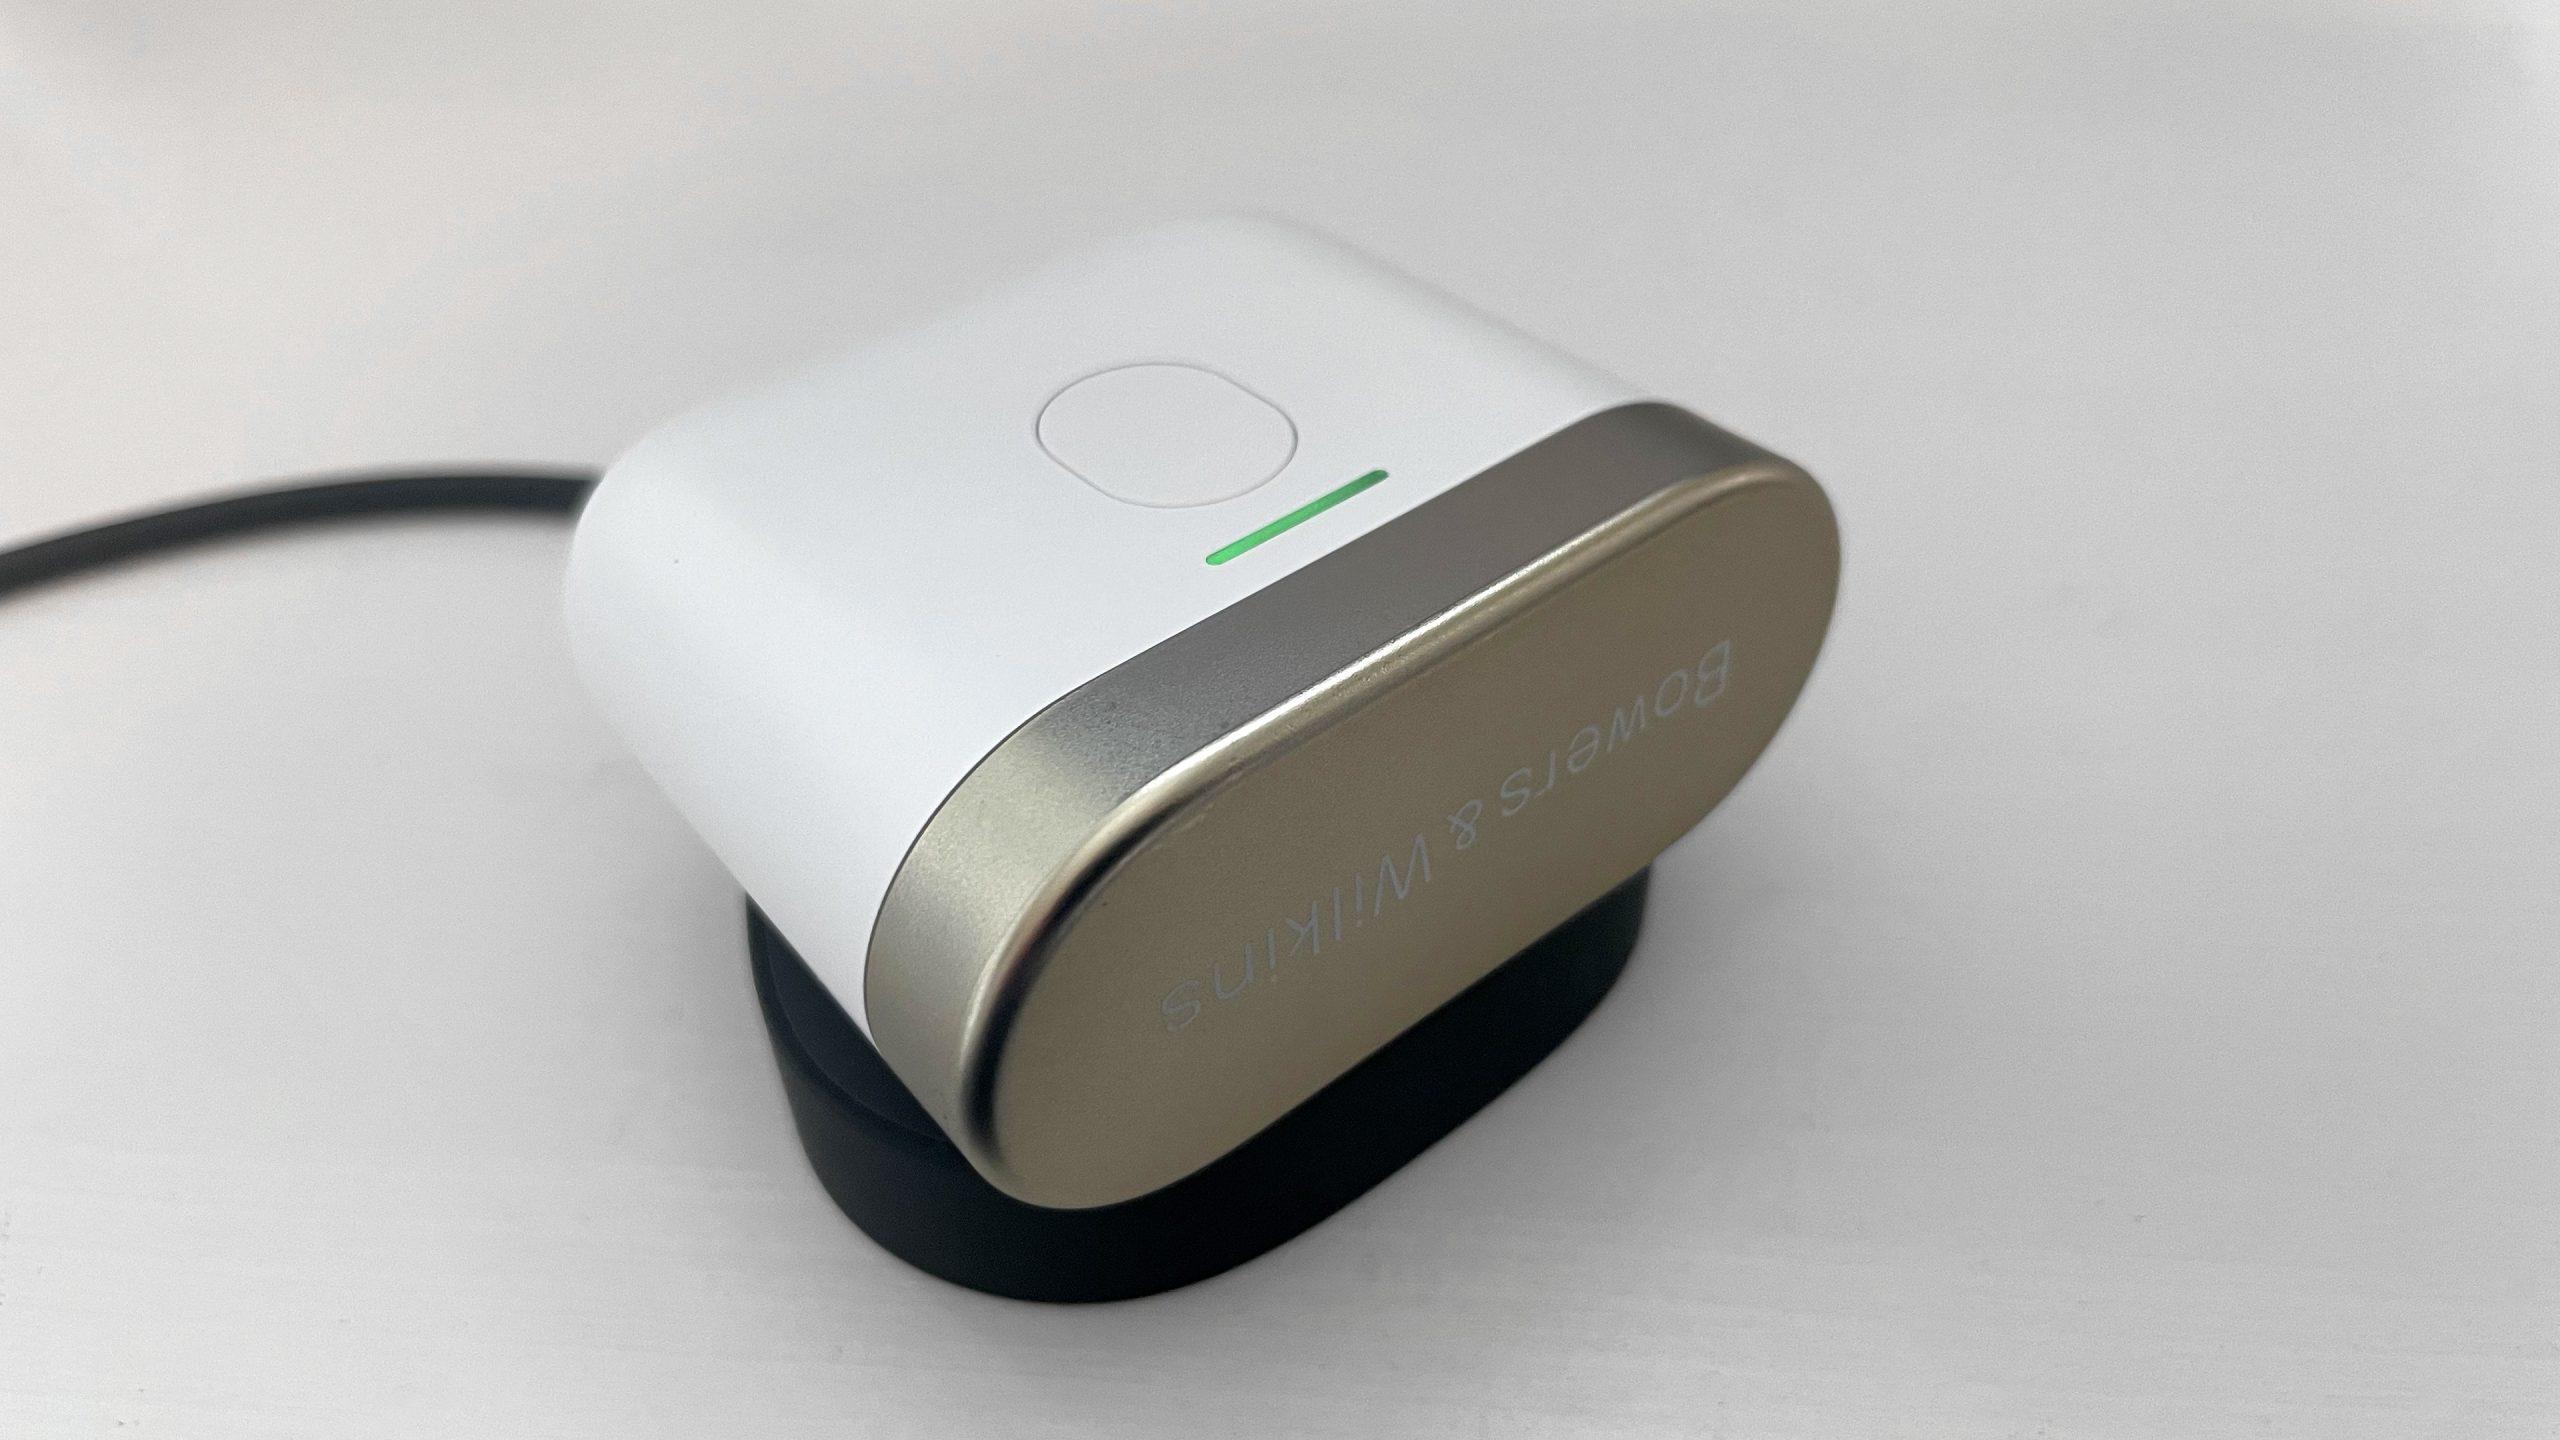 B&W PI7 Wireless Charging